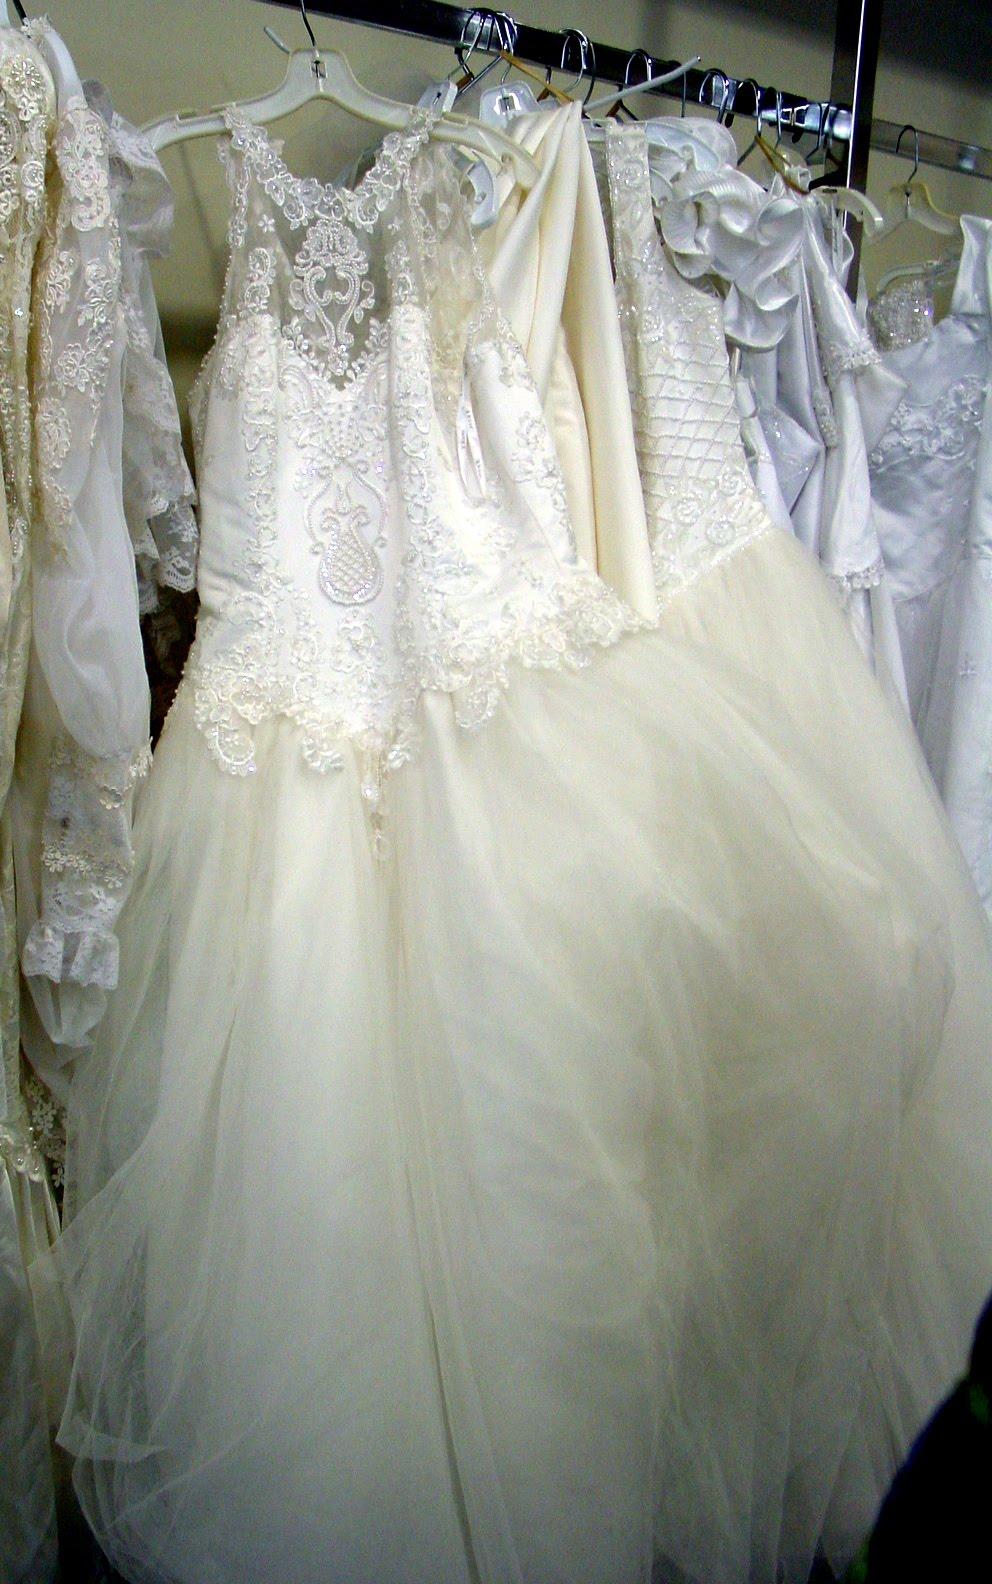 salvation army wedding dresses photo - 1